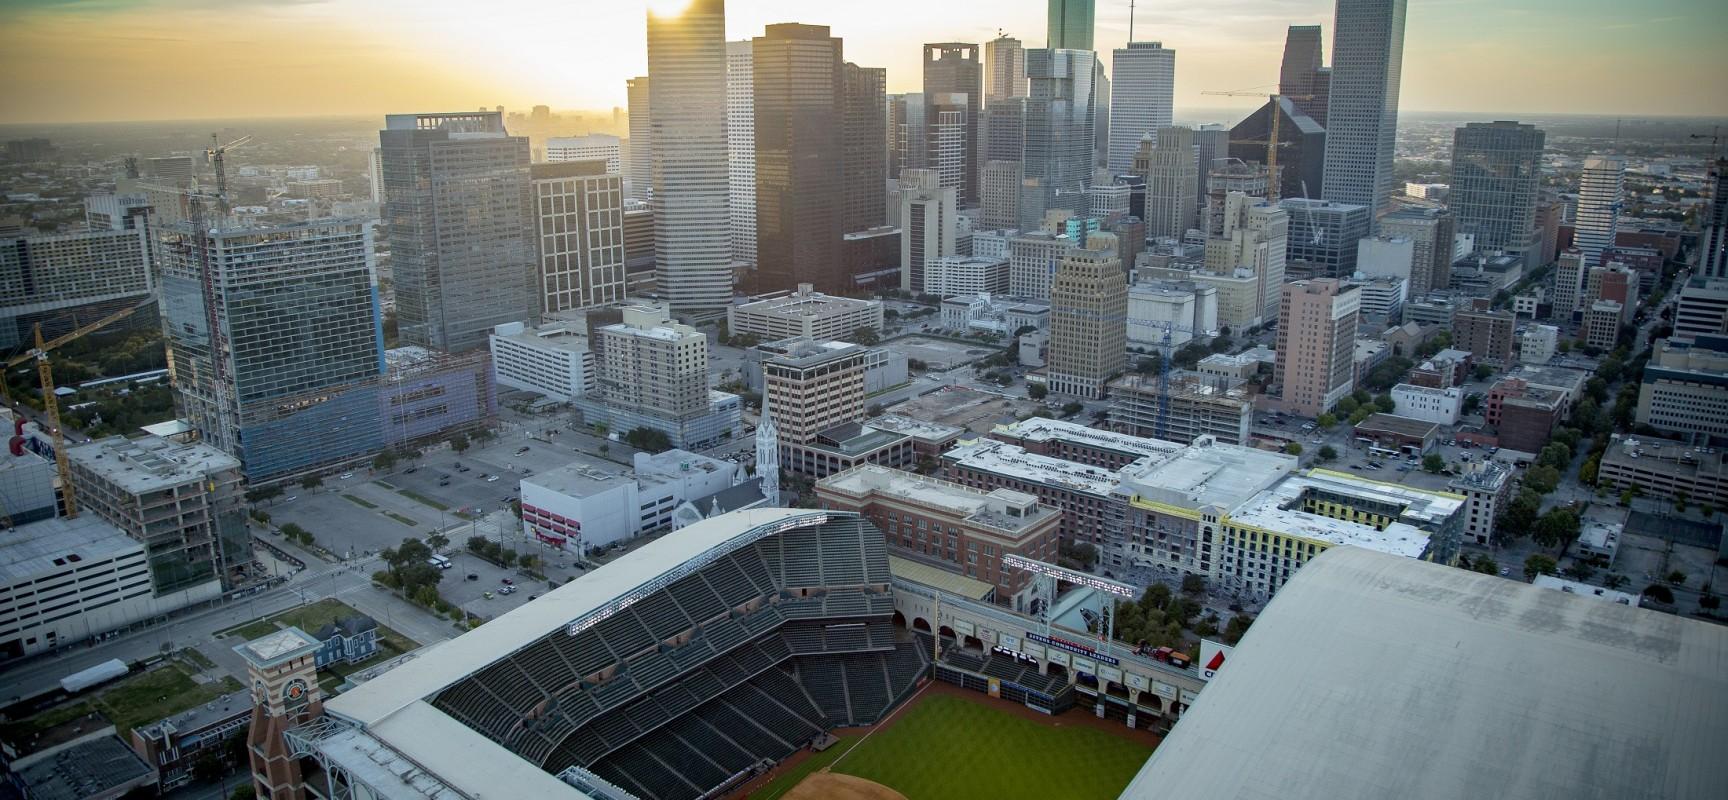 Al Hartman on the City Full of Life: Houston